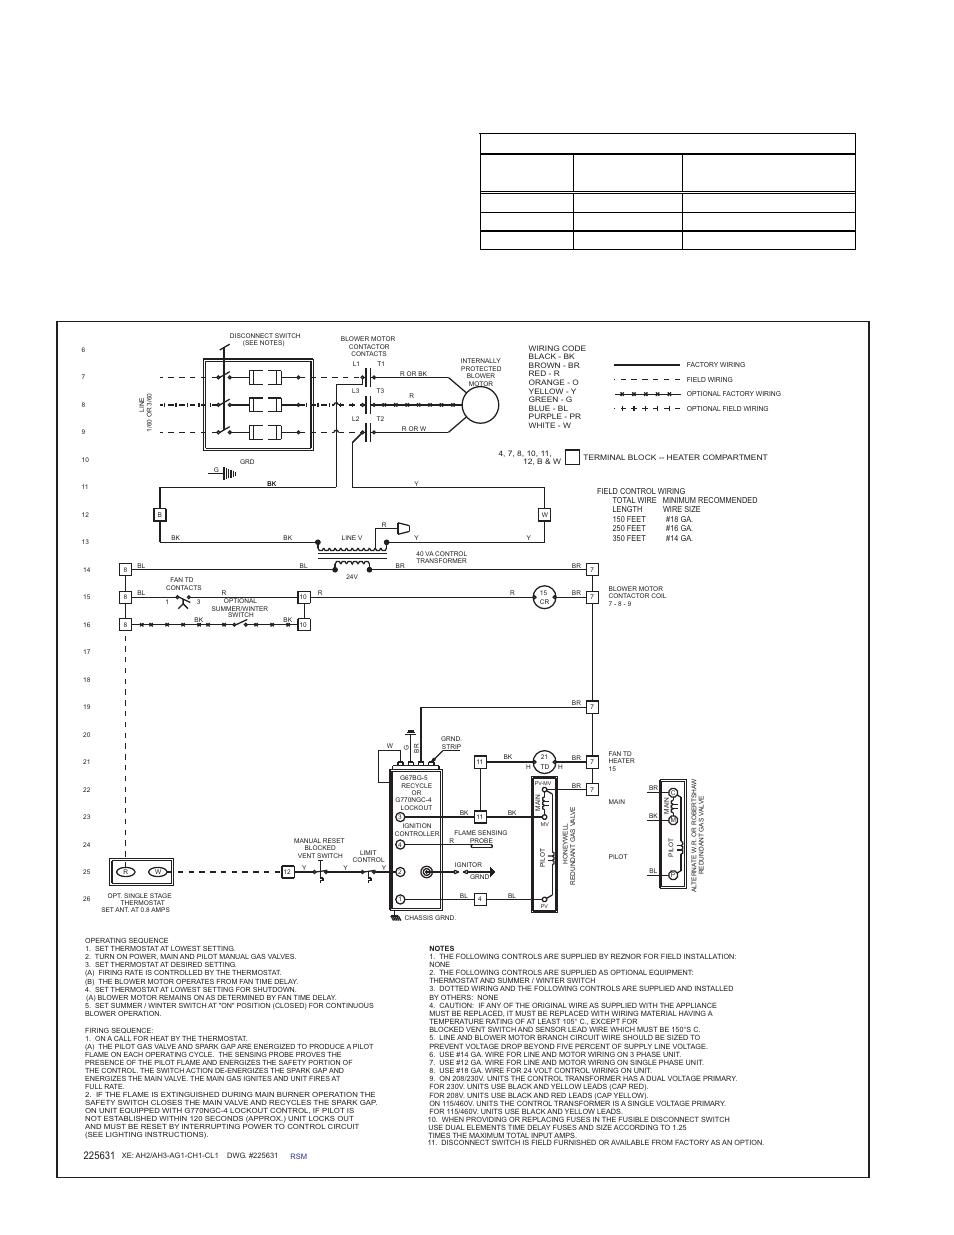 modine unit heater distributors lskair modine commercial and